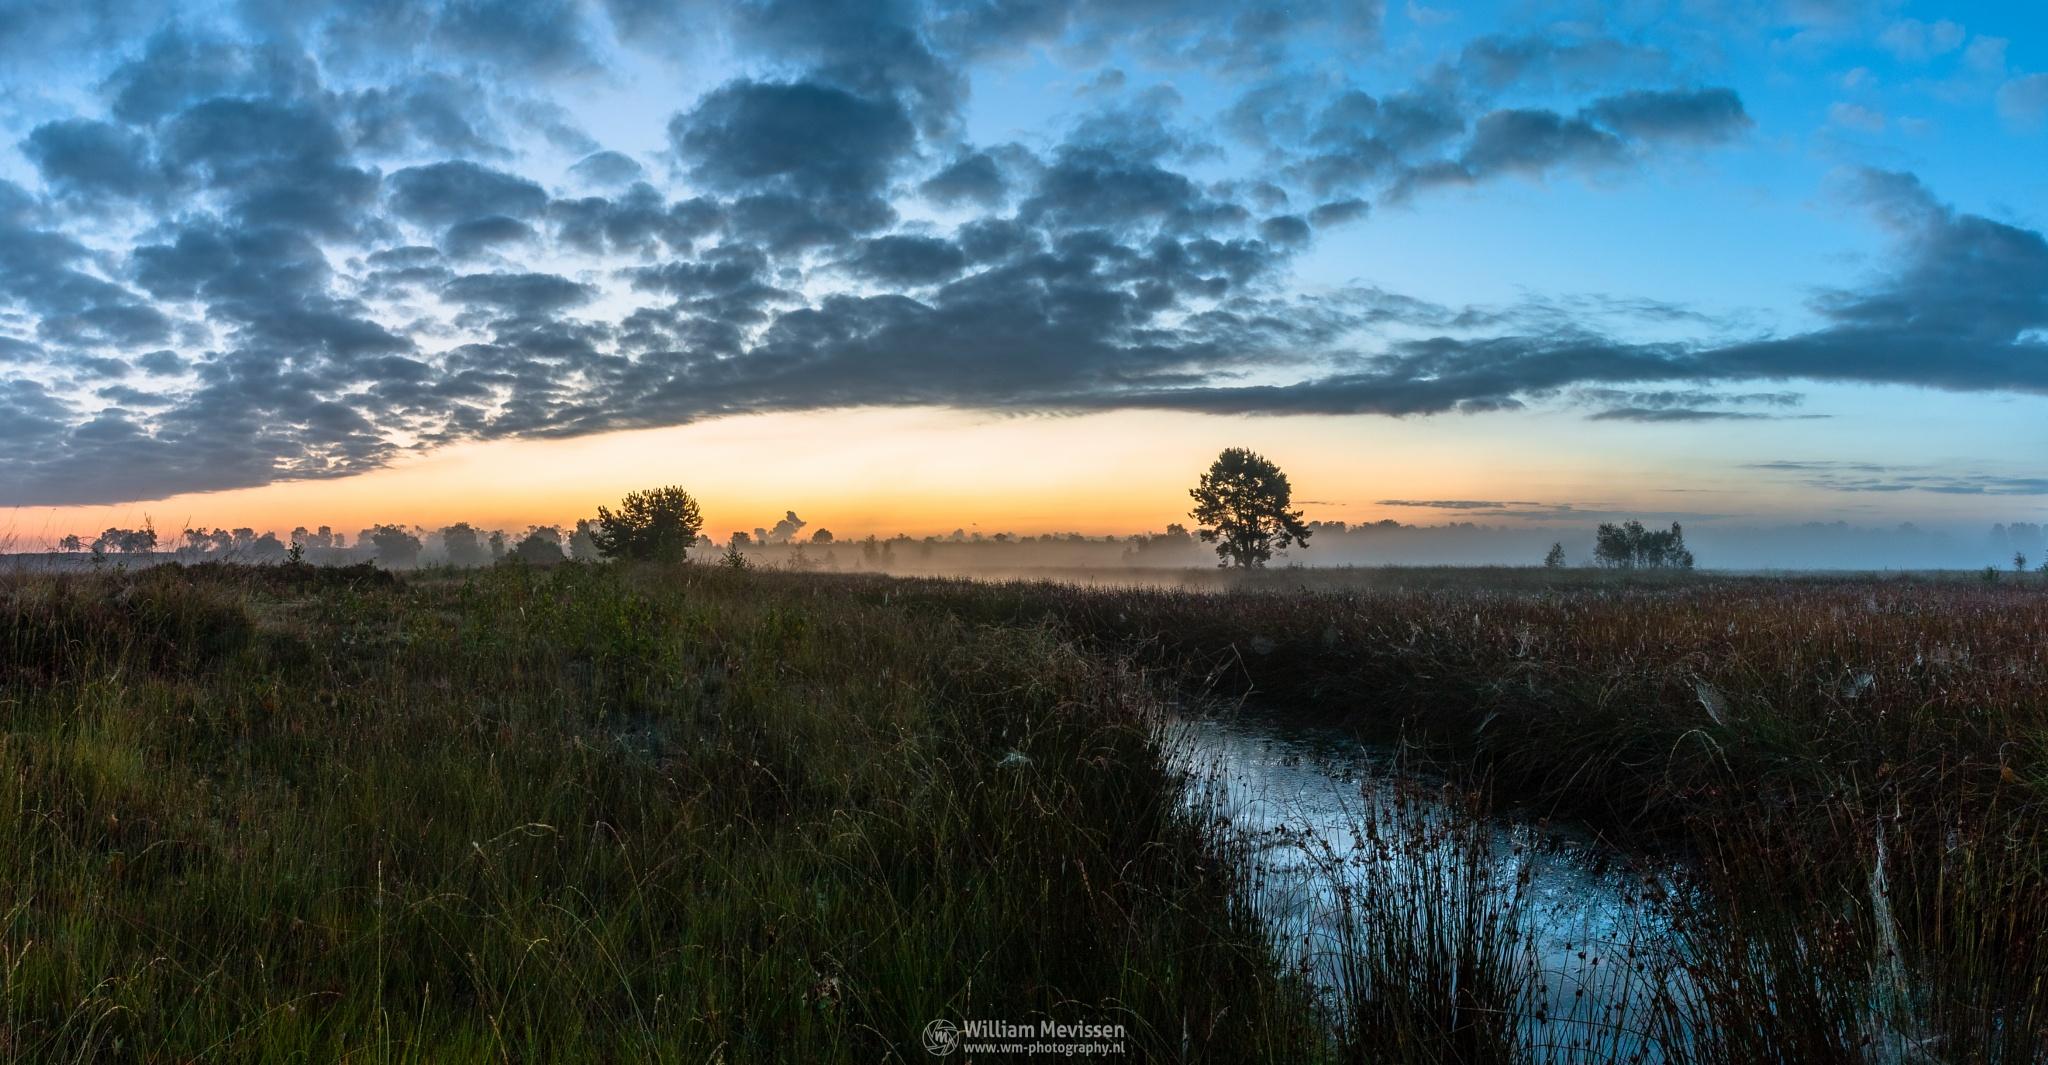 Photo in Landscape #sunrise #orange #yellow #blue #sunlight #light #tree #trees #sky #serene #peaceful #clouds #landgoed #estate #de hamert #hamert #landgoed de hamert #twilight #mist #misty #fog #foggy #maasduinen #limburg #noord-limburg #wellerlooi #national park #limburgs landschap